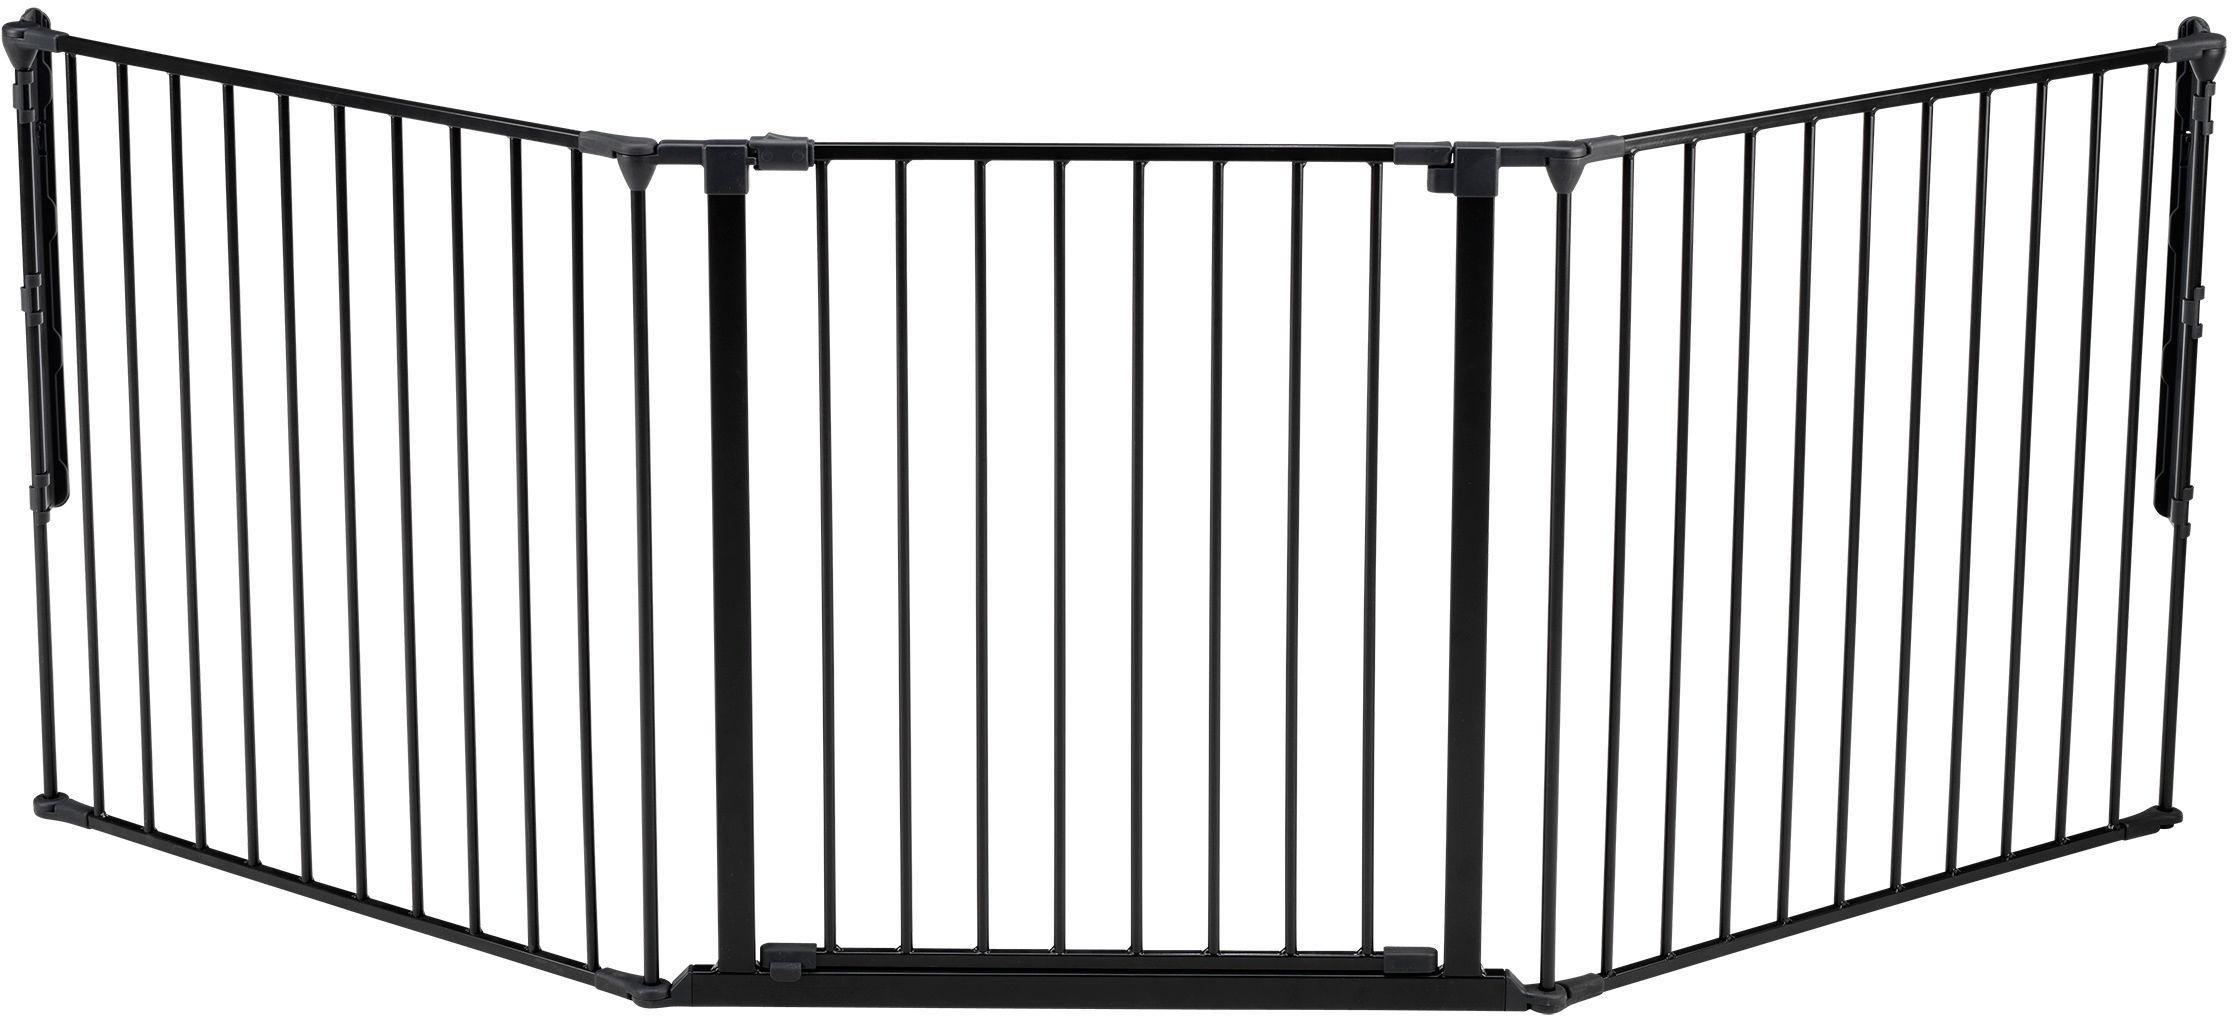 BabyDan Large Configure Gate - Black